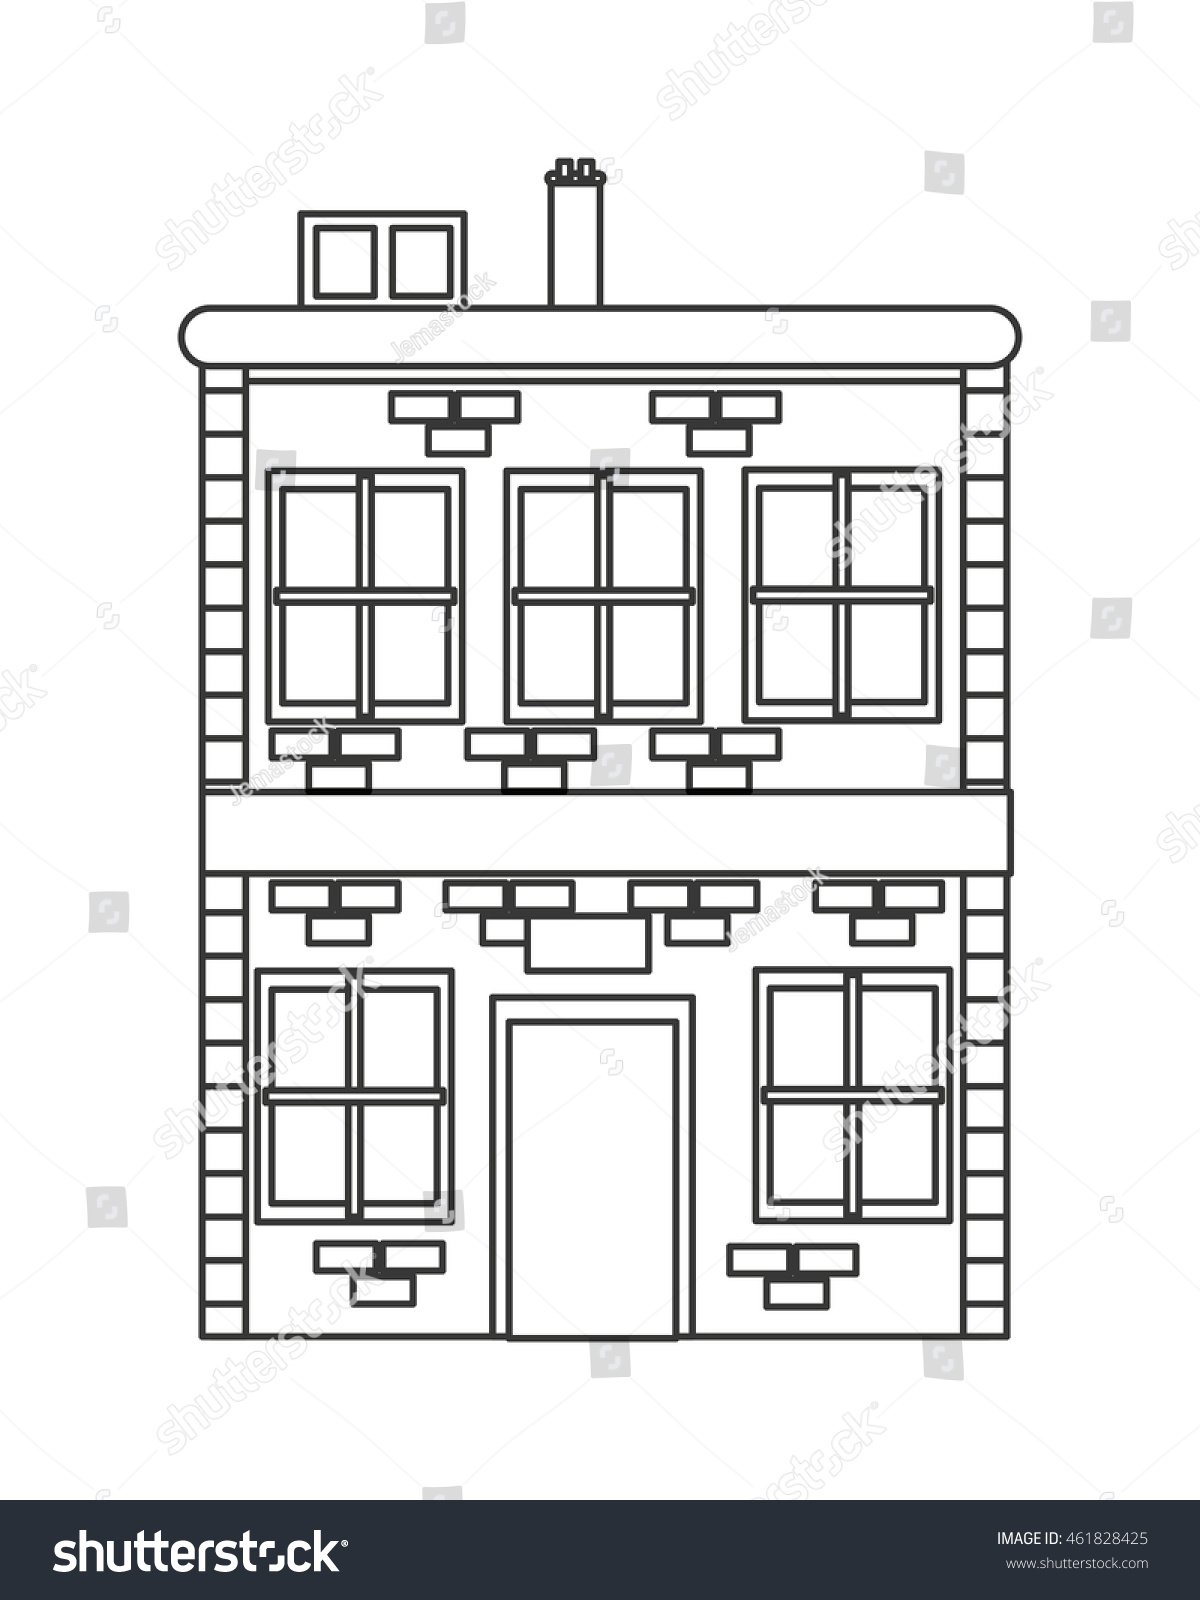 Imageshutterstock Z Stock Vector Flat